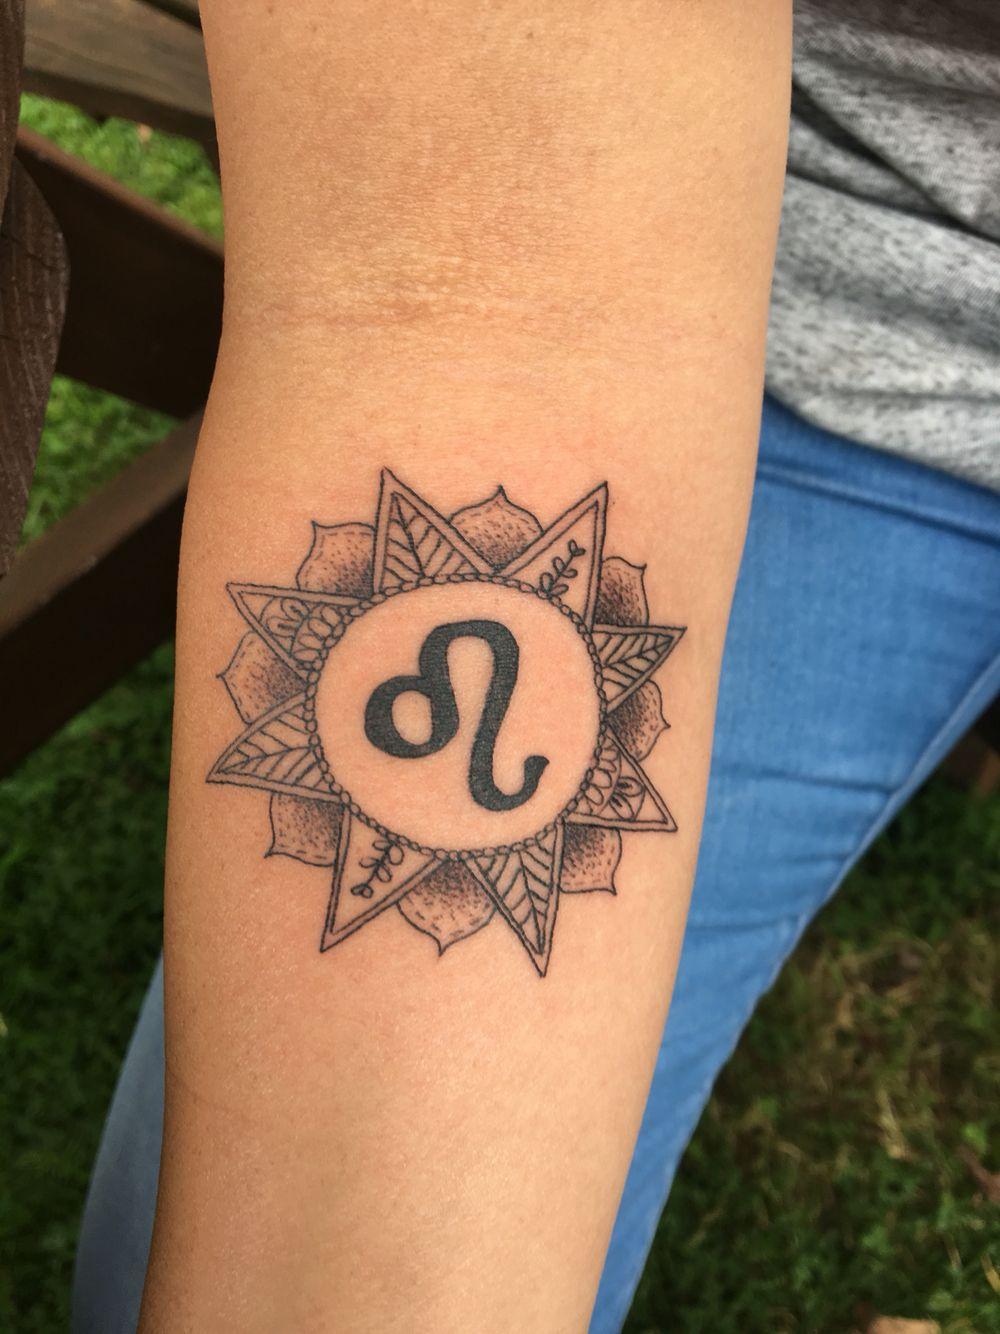 10+ Amazing Small leo zodiac tattoos ideas in 2021